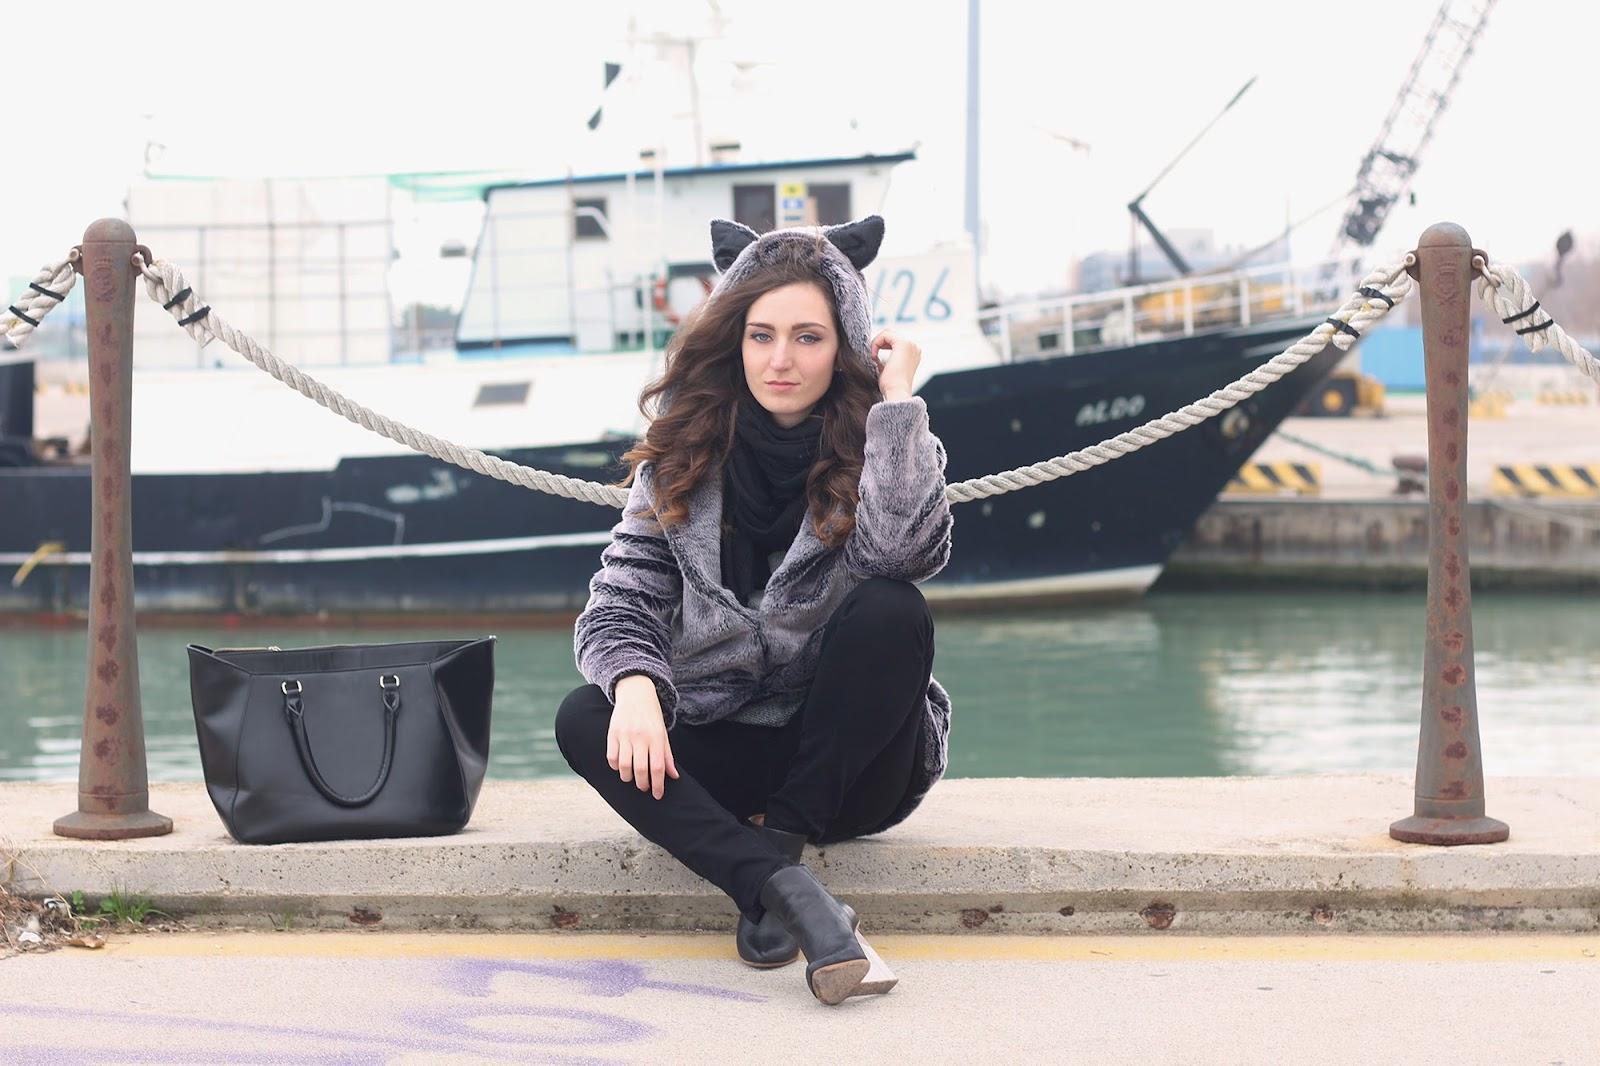 fashion style look trend outfit ootd vogue glamour girl love italian blogger pescara sammydress ears faux fur zara bag black boots hm maison martin margiela transparent heels shoes